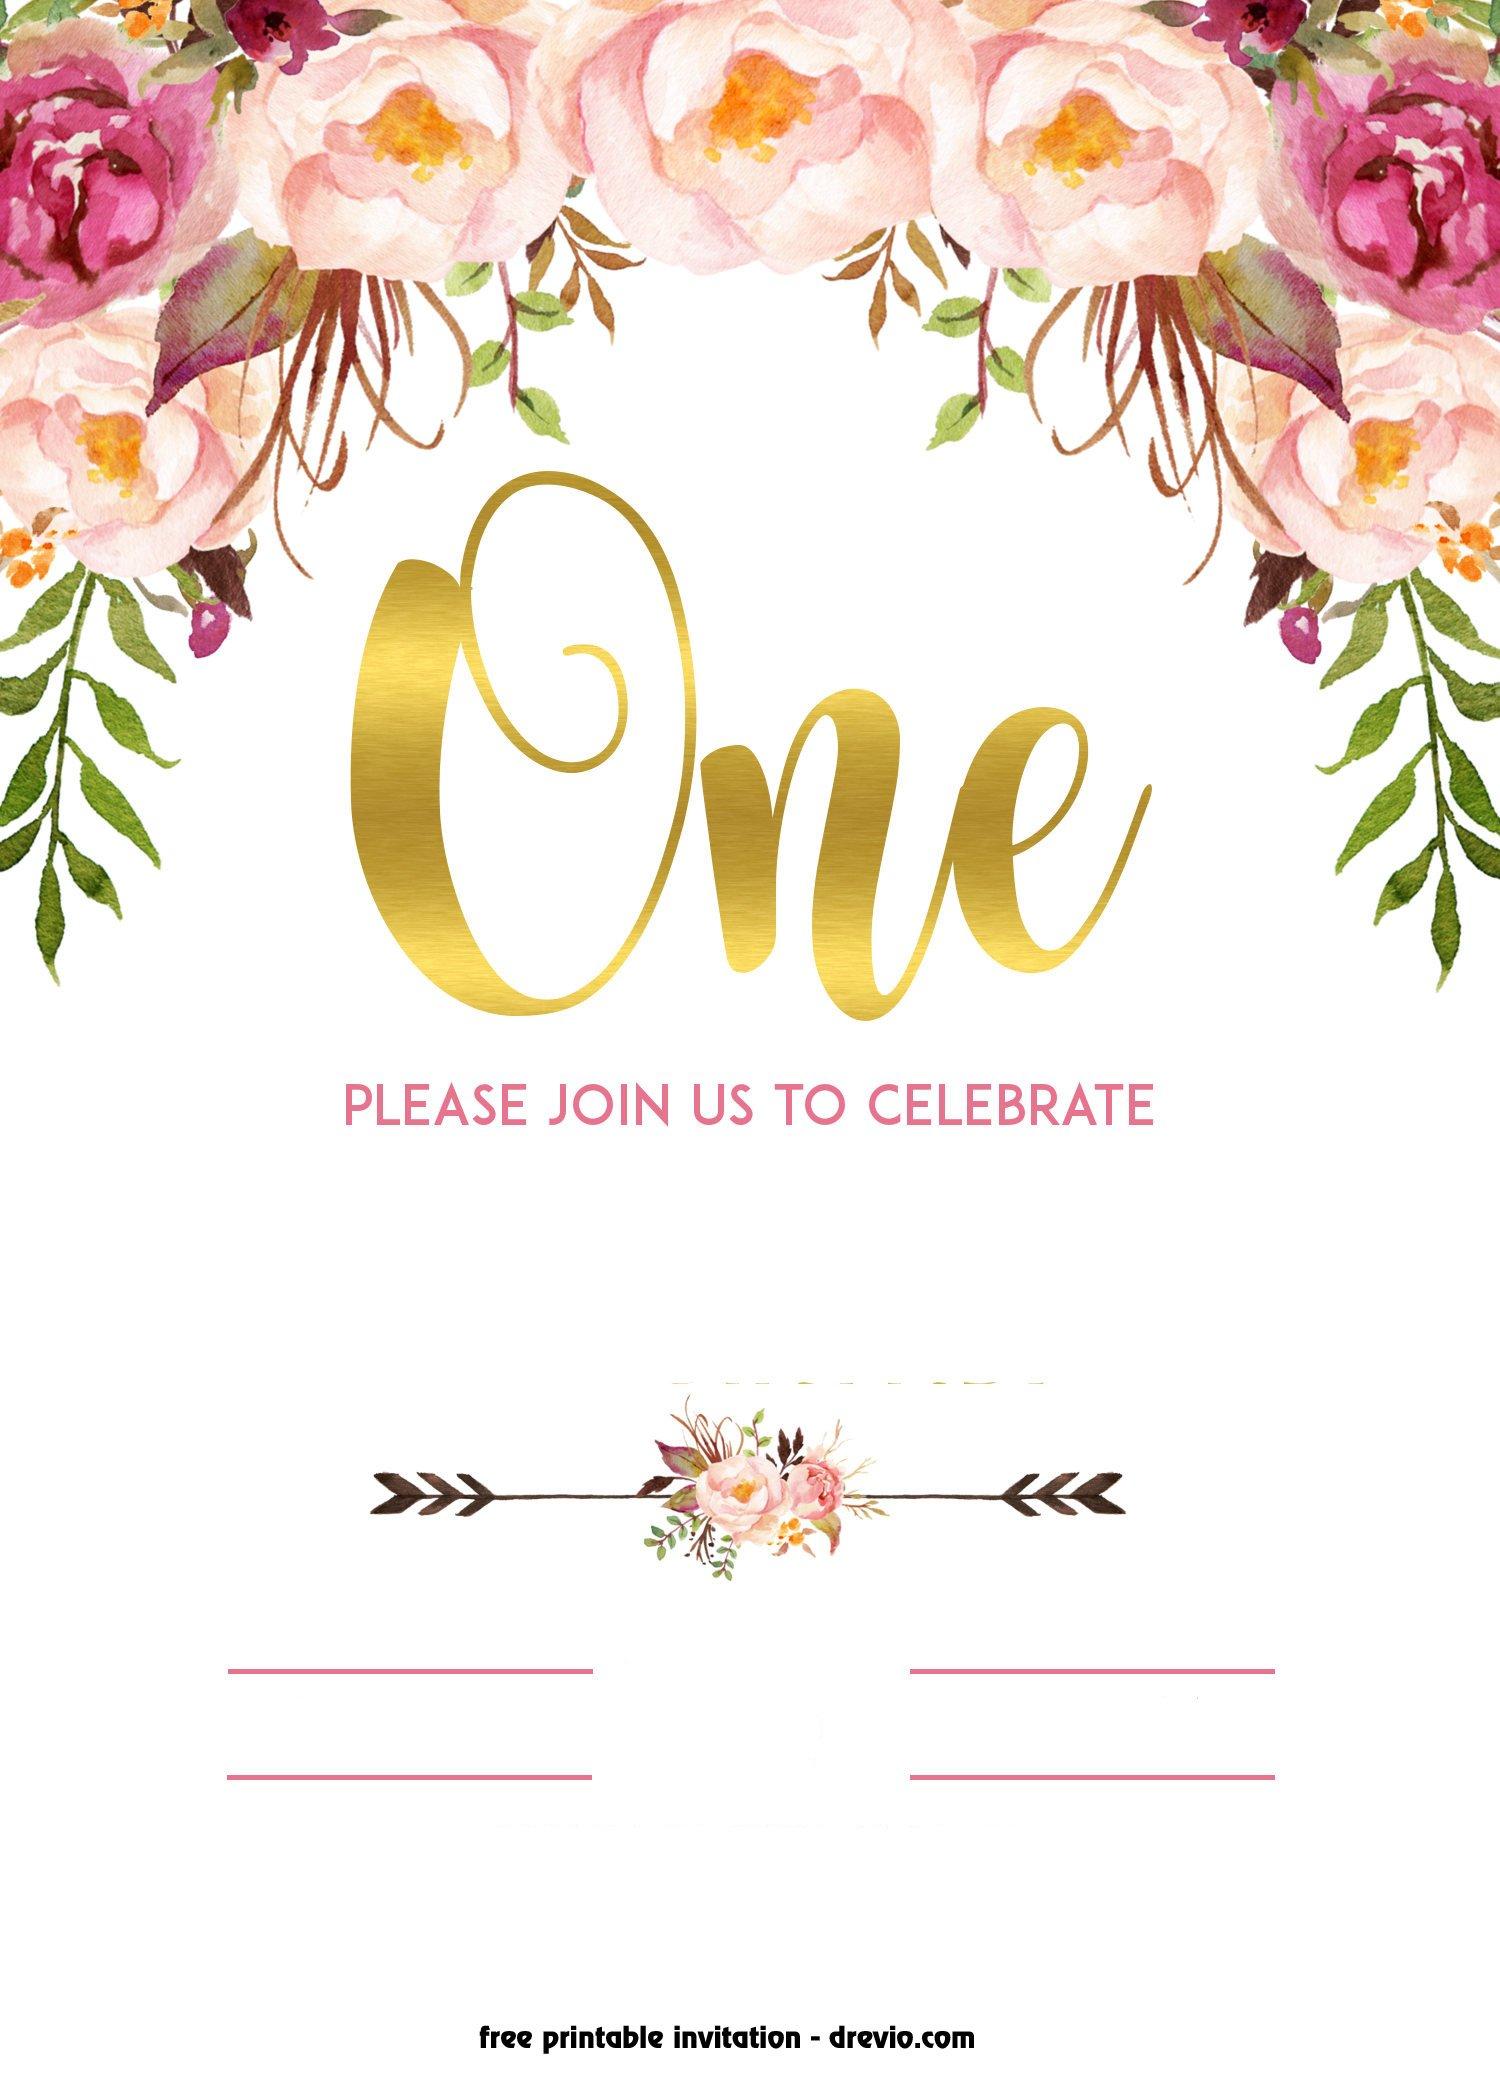 Cheap Invitations 60th Birthday